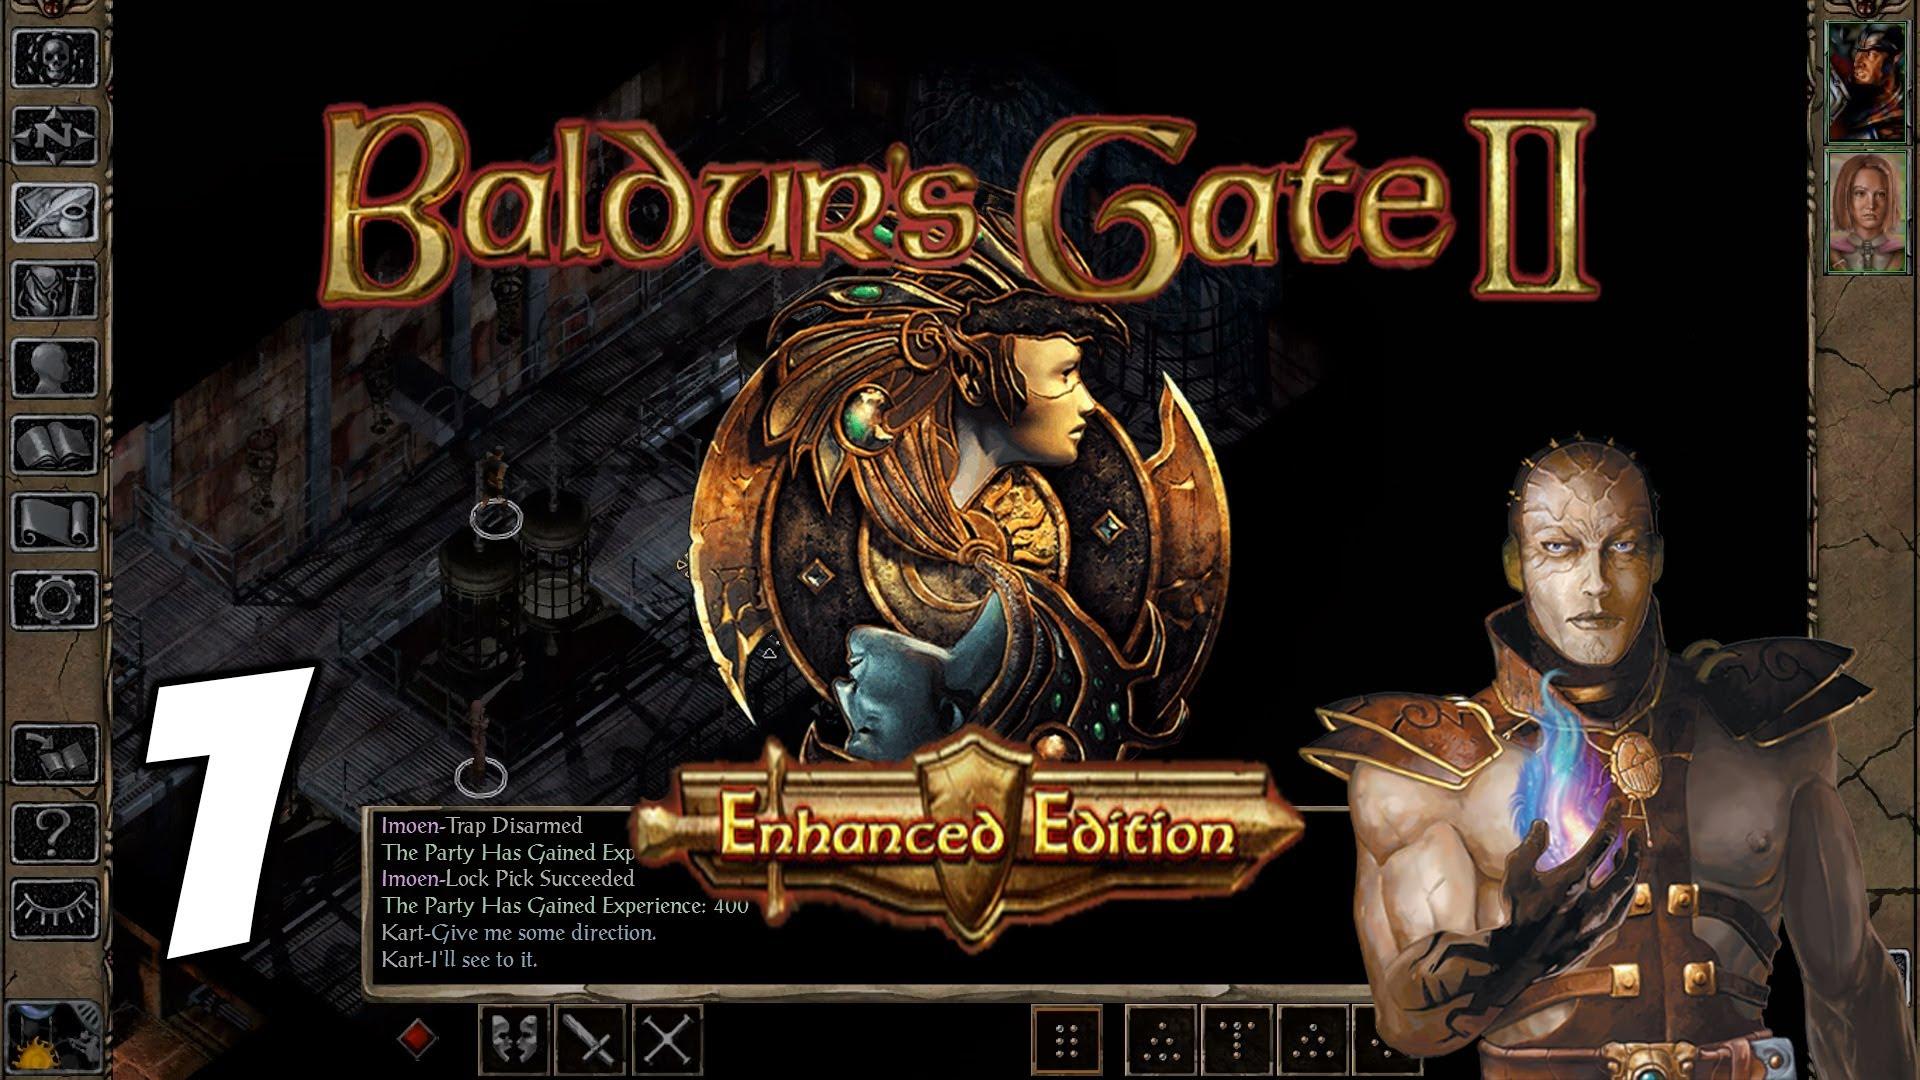 [gog.com] Sale auf Baldur's Gate Reihe Enhanced Edition (Einzeltitel 4,79€)